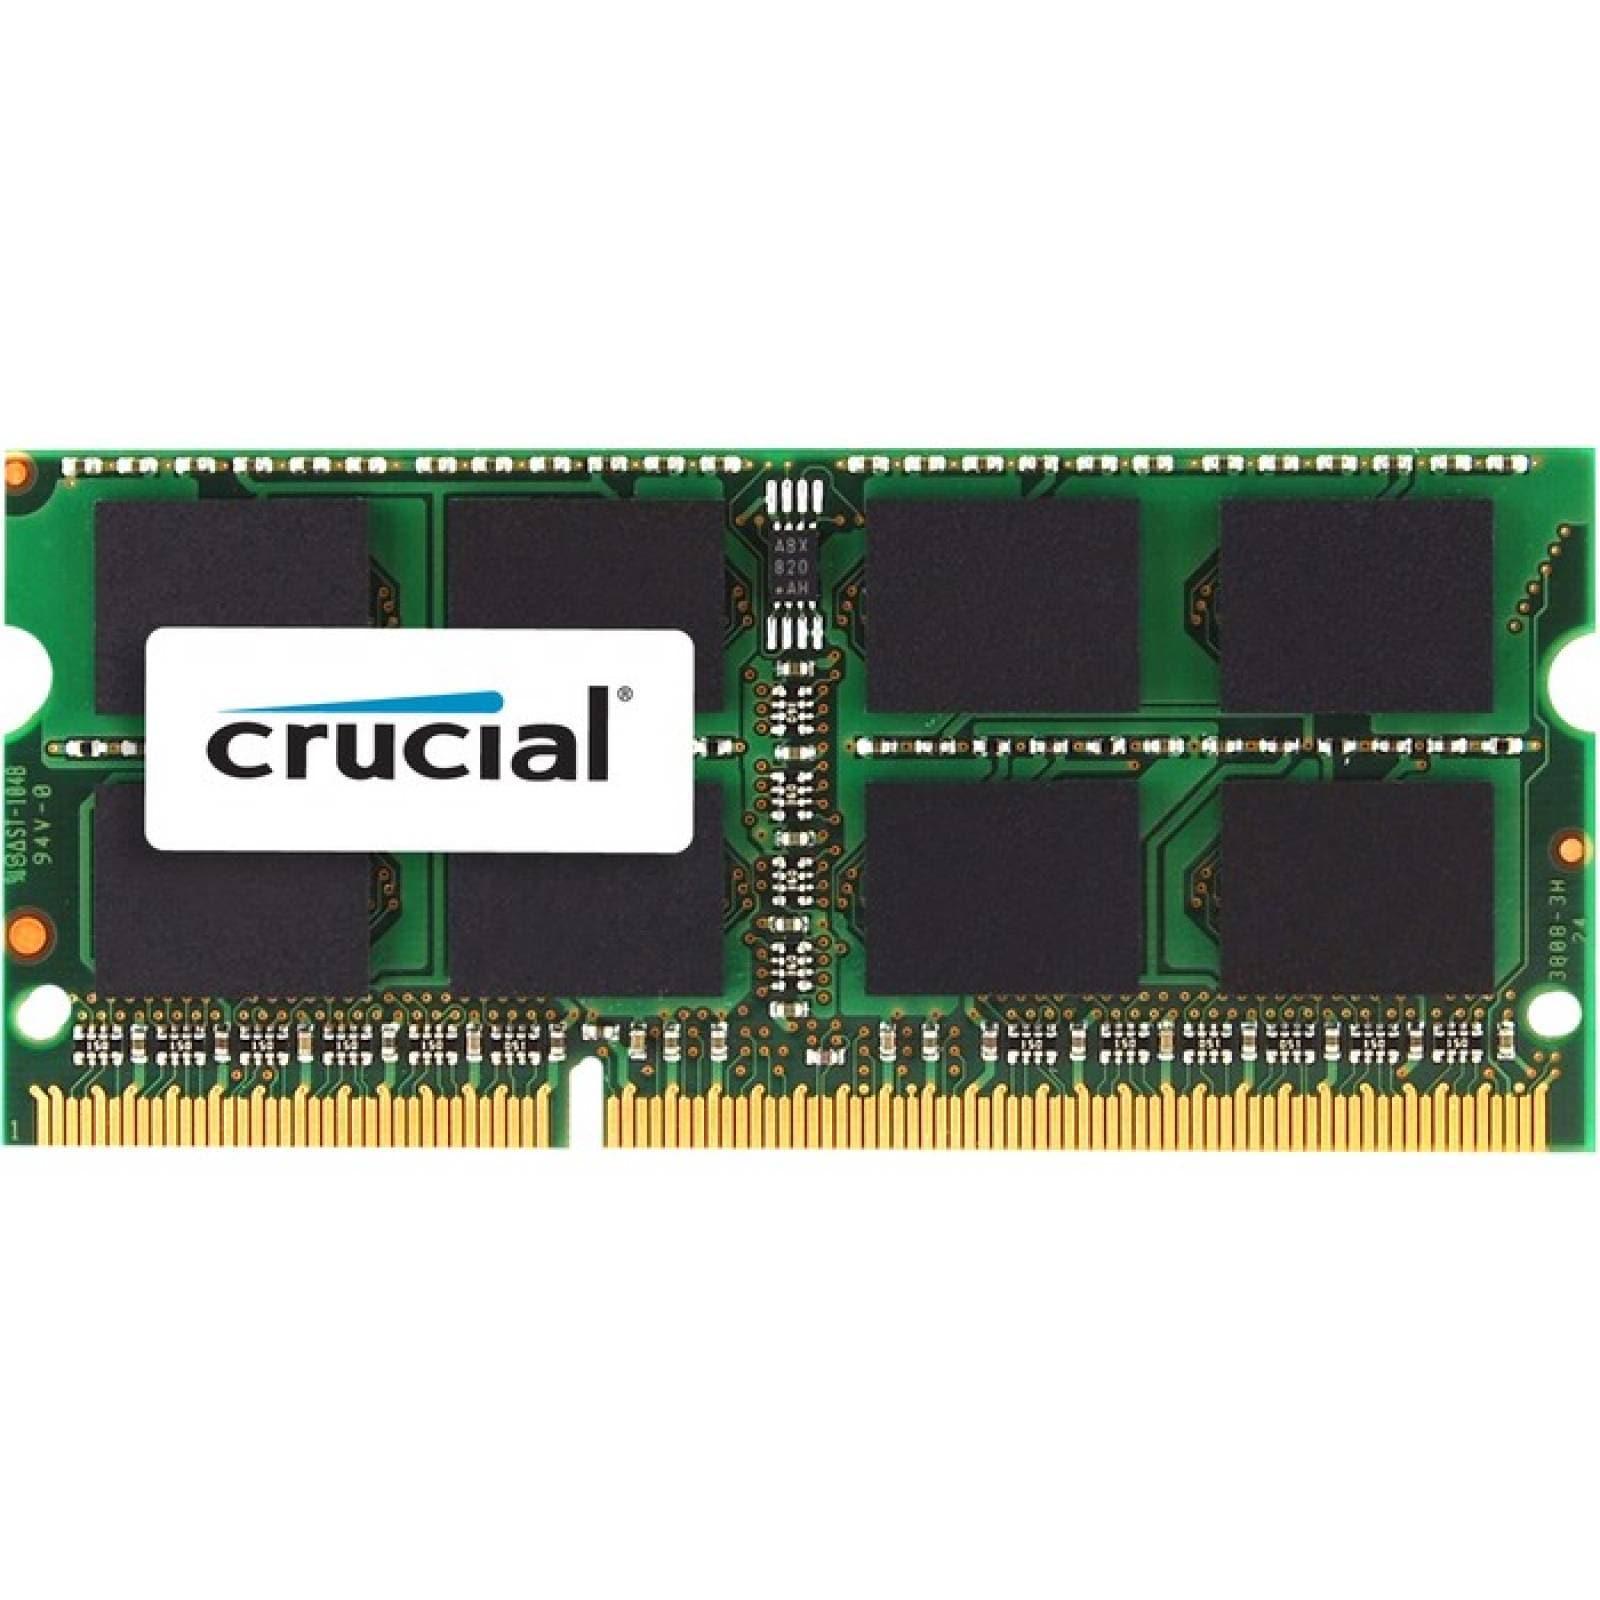 Mdulo de memoria SDRAM DDR3 de 8 GB (1 x 8 GB) crucial